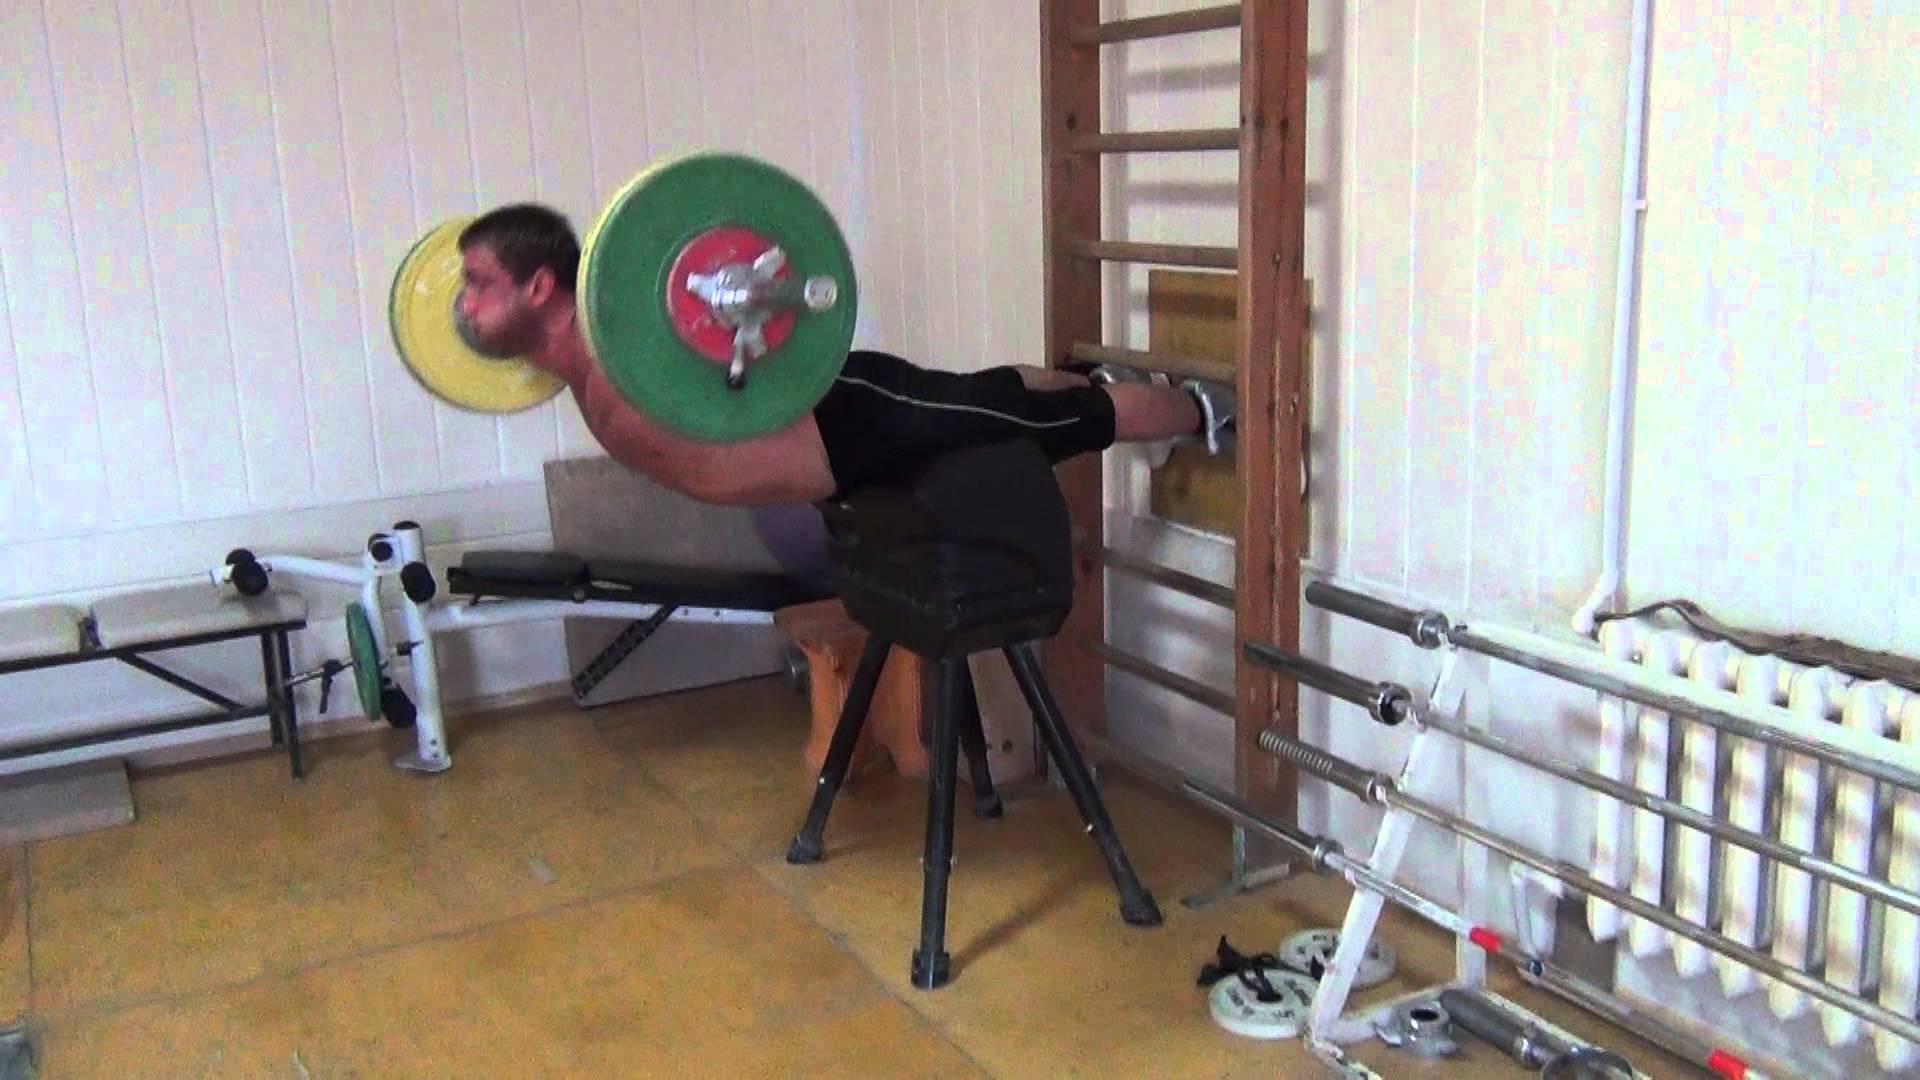 Dmitry Klokov Back Hyperextensions *Update* - All Things Gym